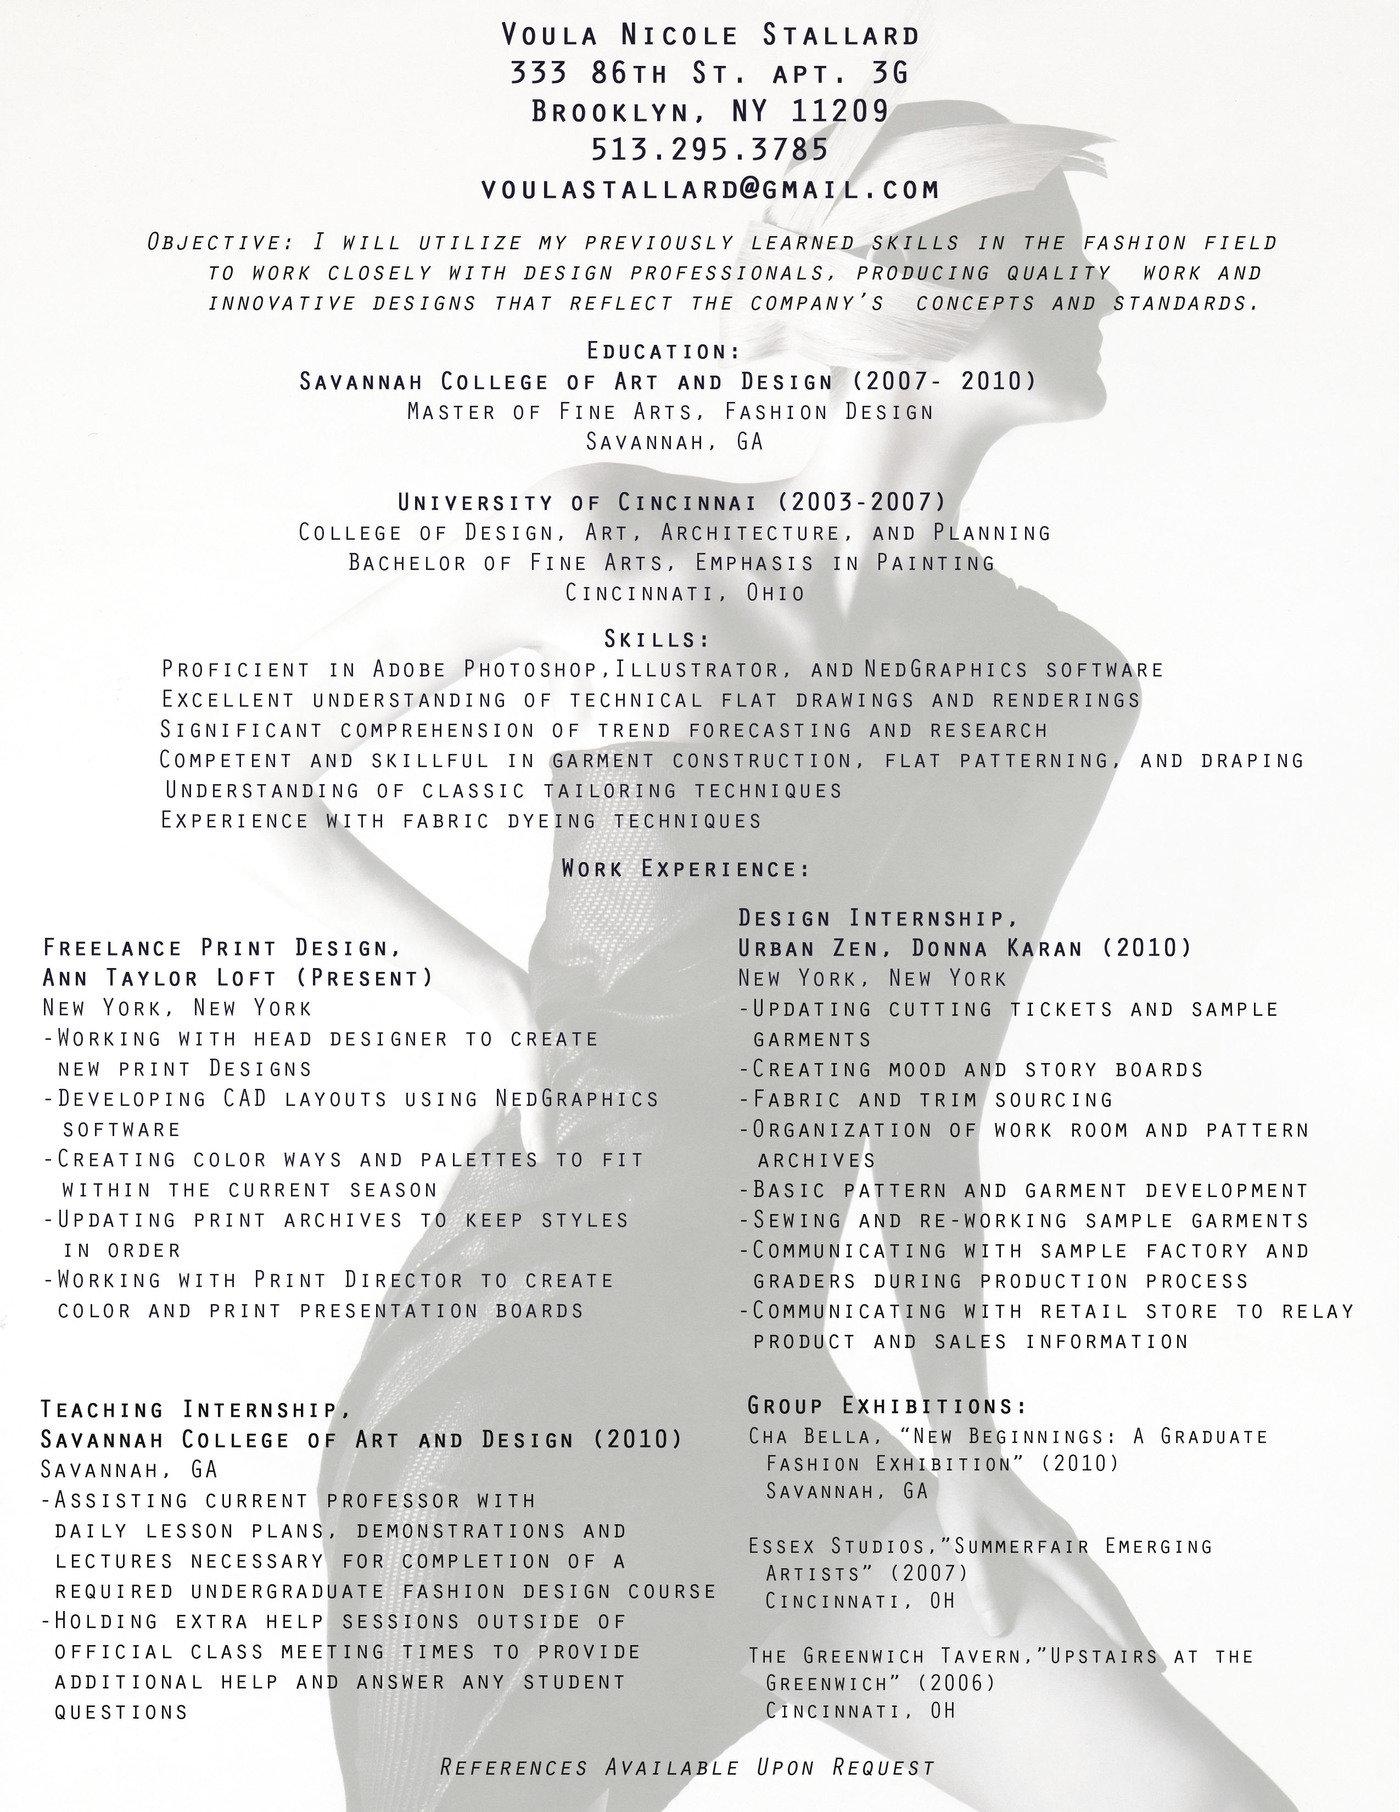 Resume By Voula Stallard At Coroflot Com